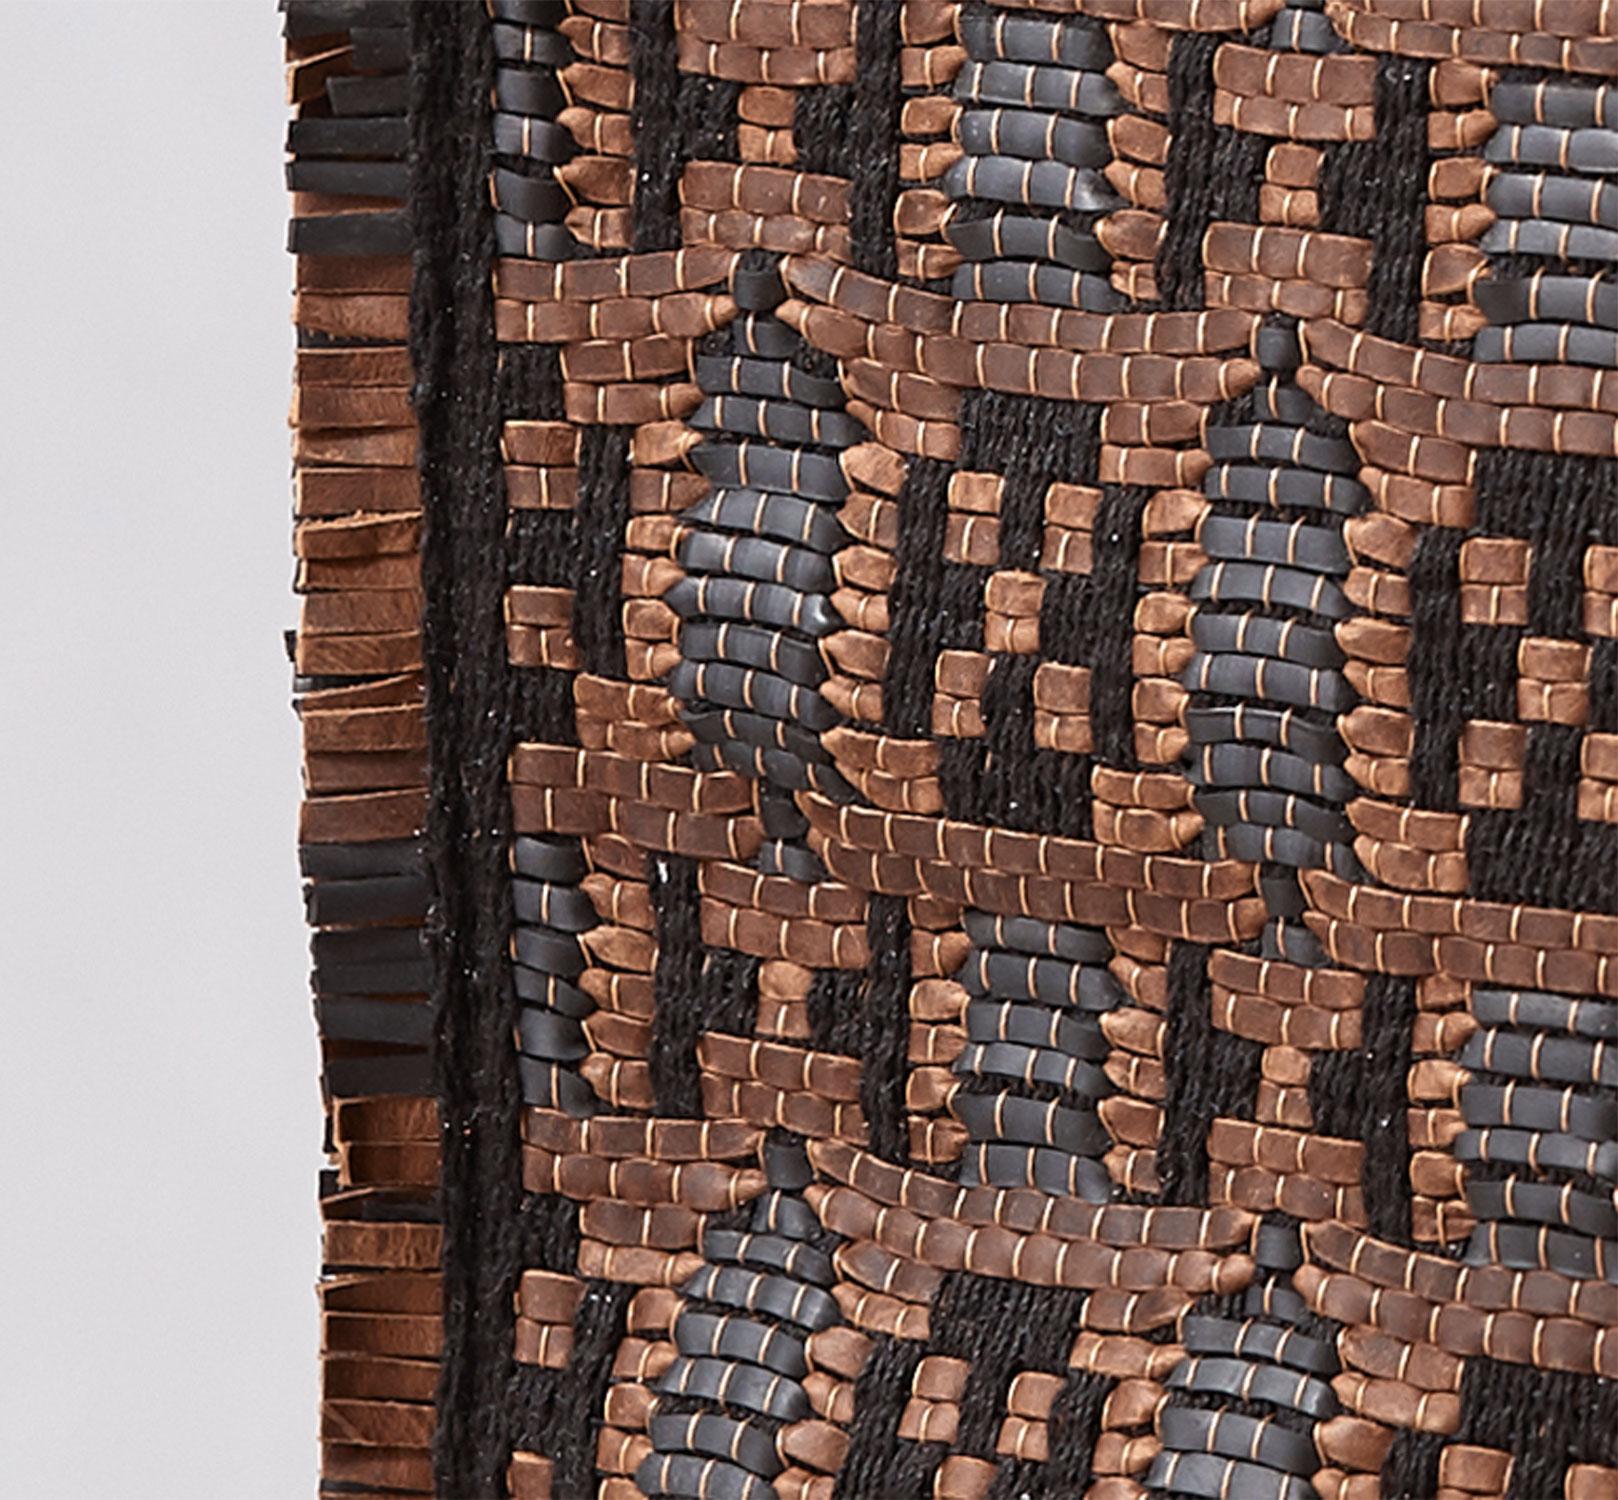 Myriad---innertube-and-brown-leather_side_web.jpg